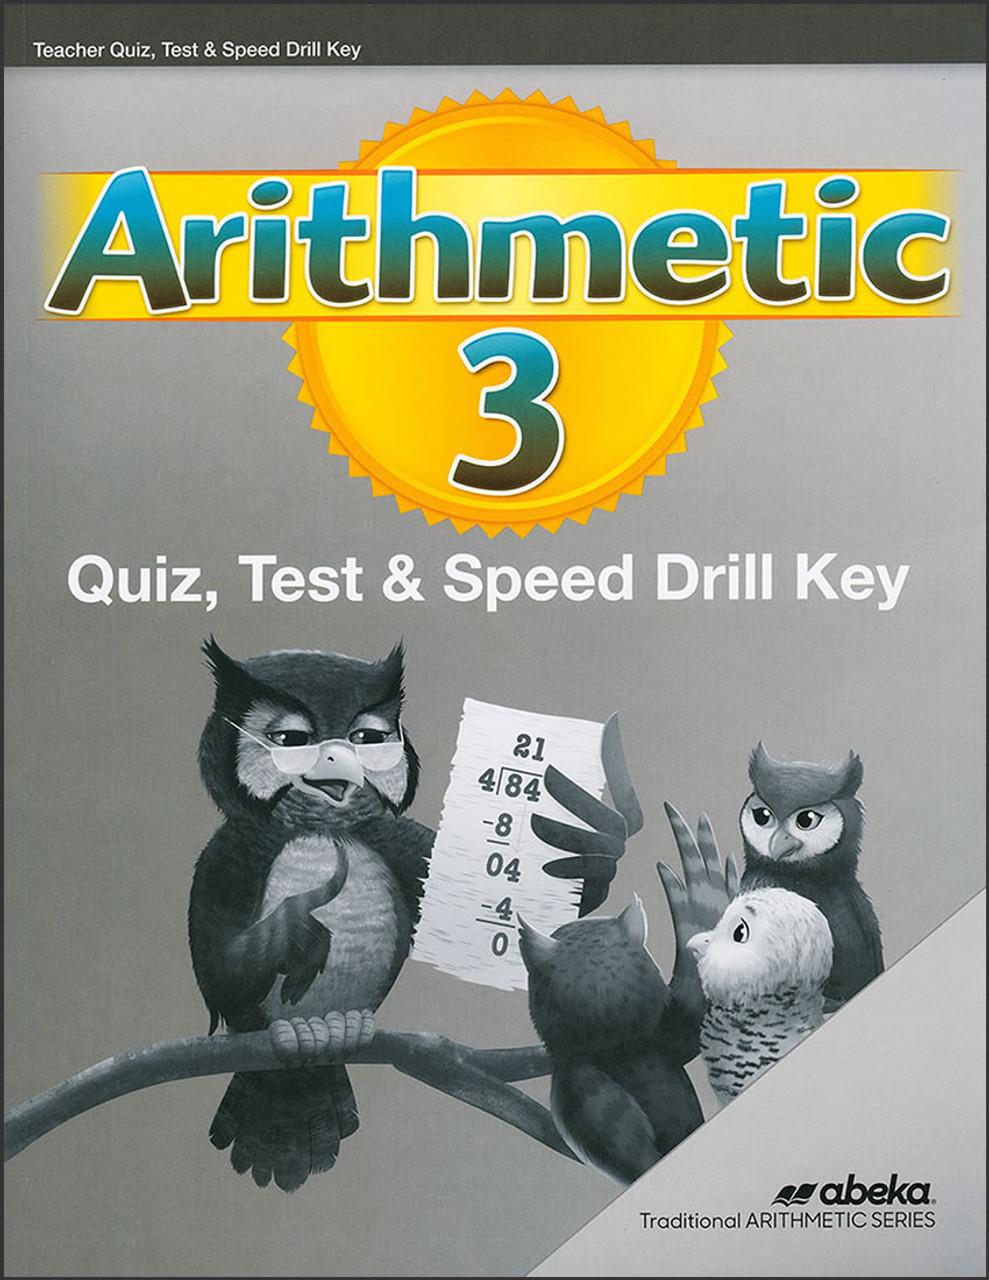 Arithmetic 3, 6th edition - Quiz, Test & Speed Drill Key